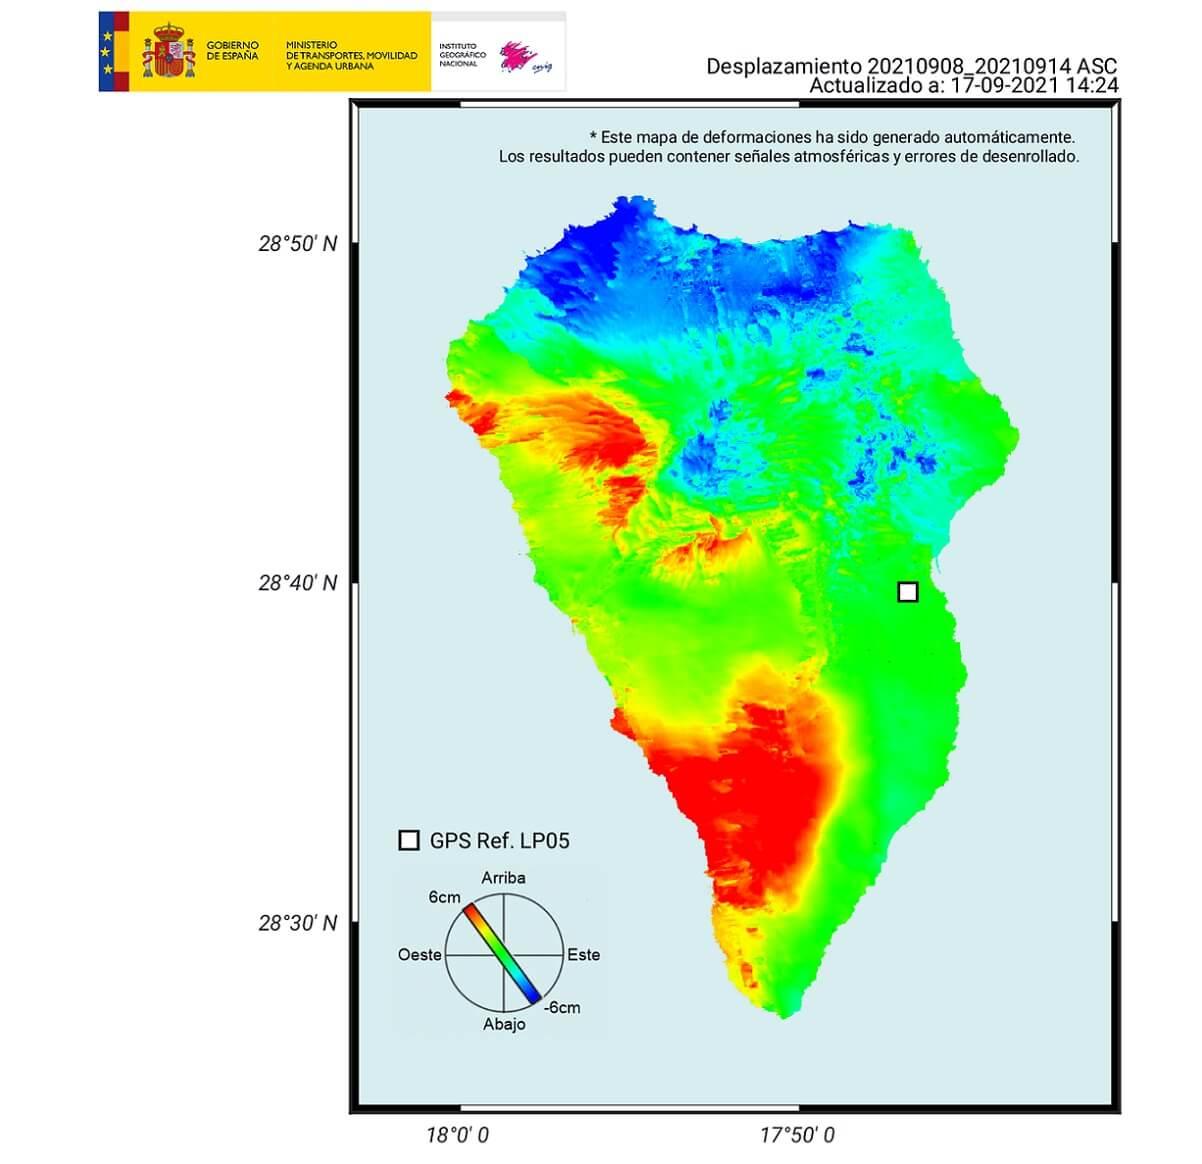 la-palma-cumbre-vieja-volcano-canary-islands-eruption-2021-ground-deformation-uplift